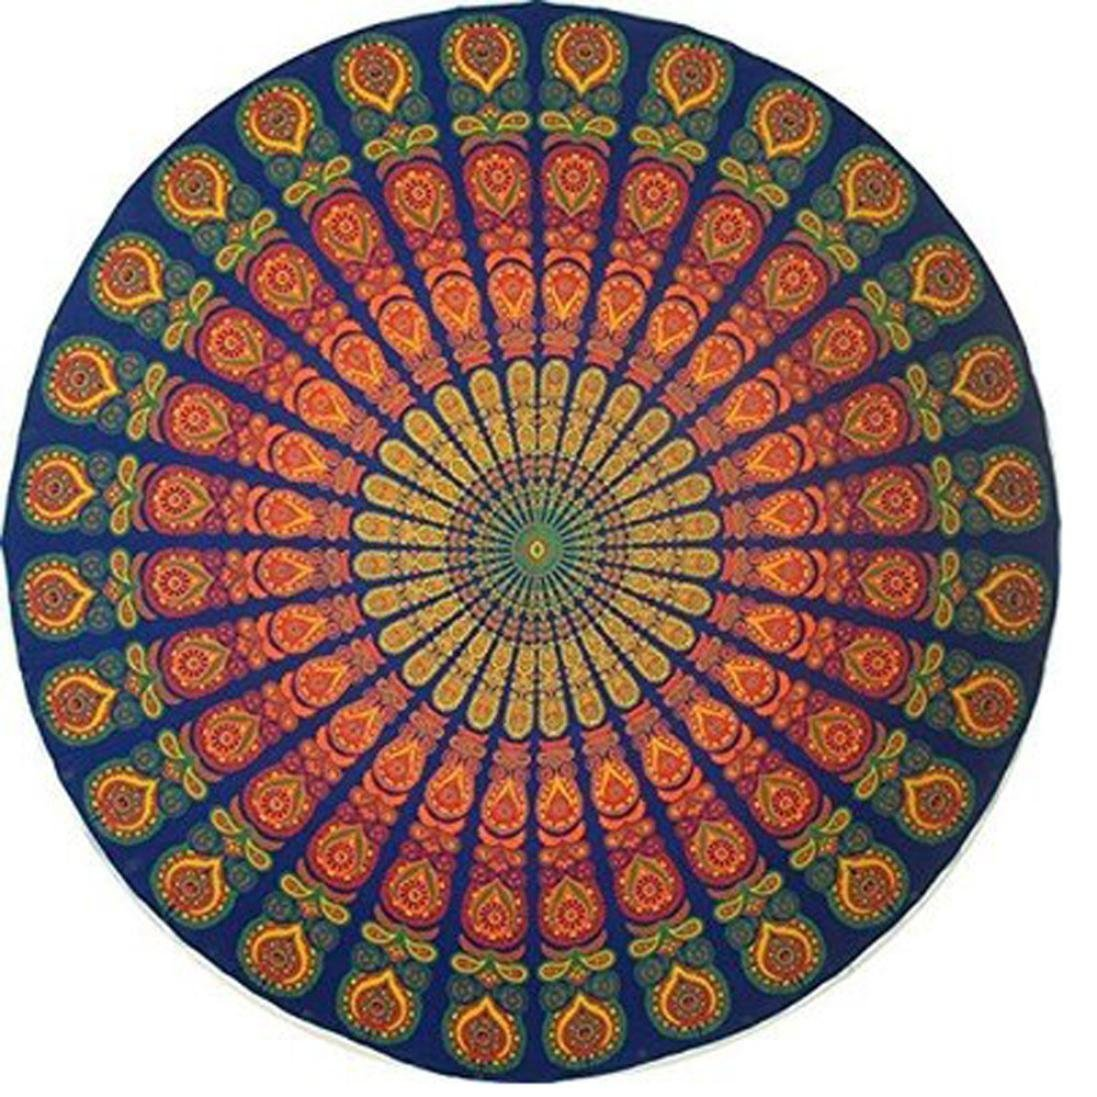 "Traditional India- Indian Cotton Mandala Roundies, Beach Throw, Indian Mandala Tapestry, Yoga Mat, Picnic Mat, Table Throw, Round Meditation Mat, Oversize Beach Towel 70"""